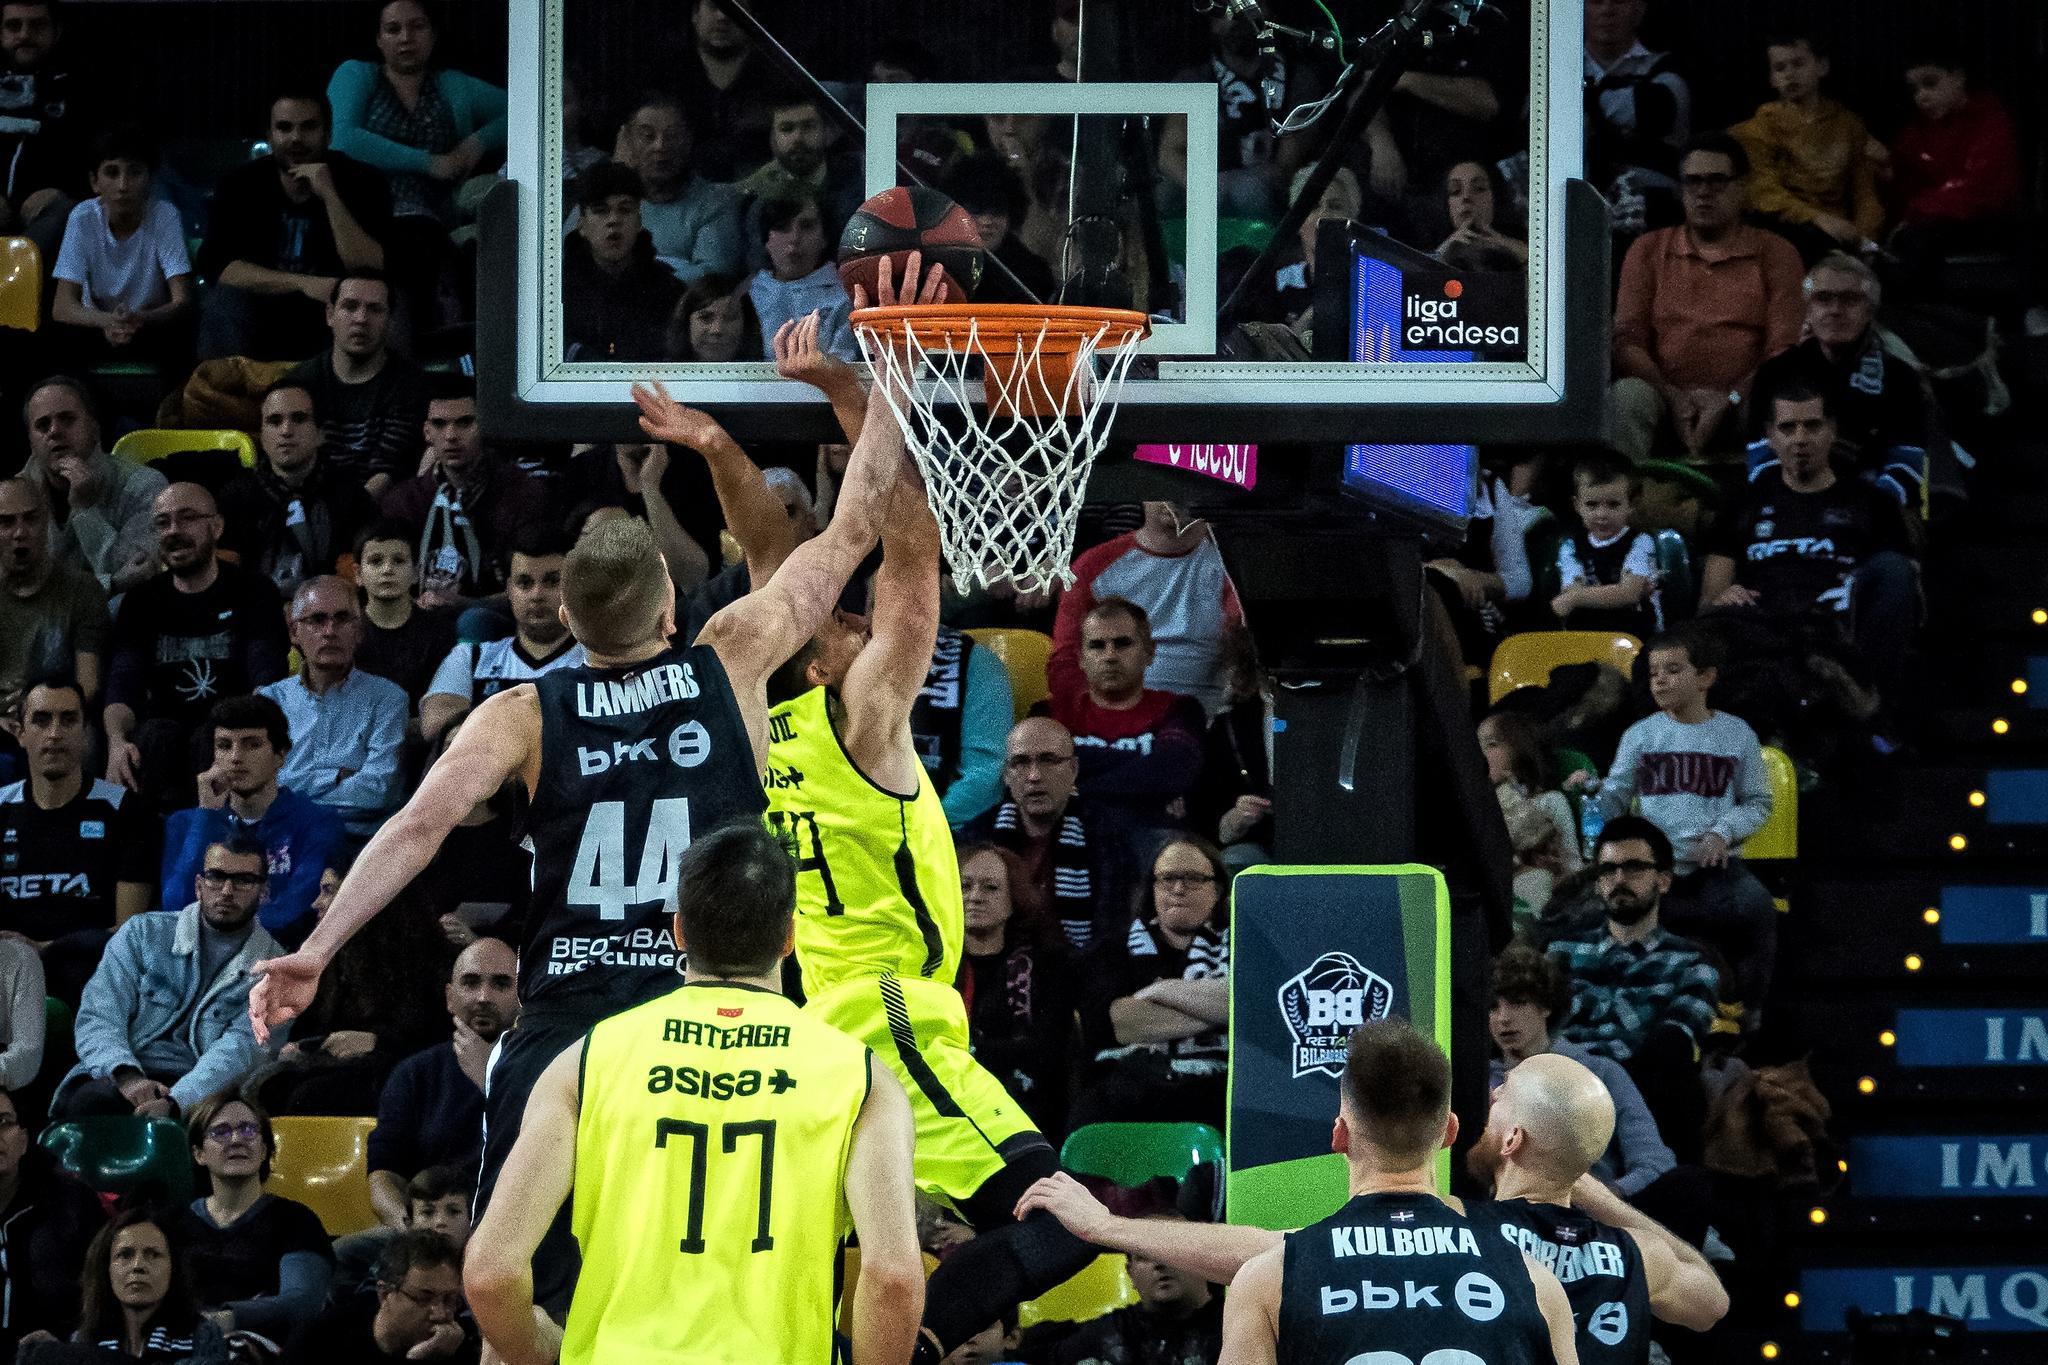 Lammers tapona a un rival (Foto: Luis Fernando Boo).